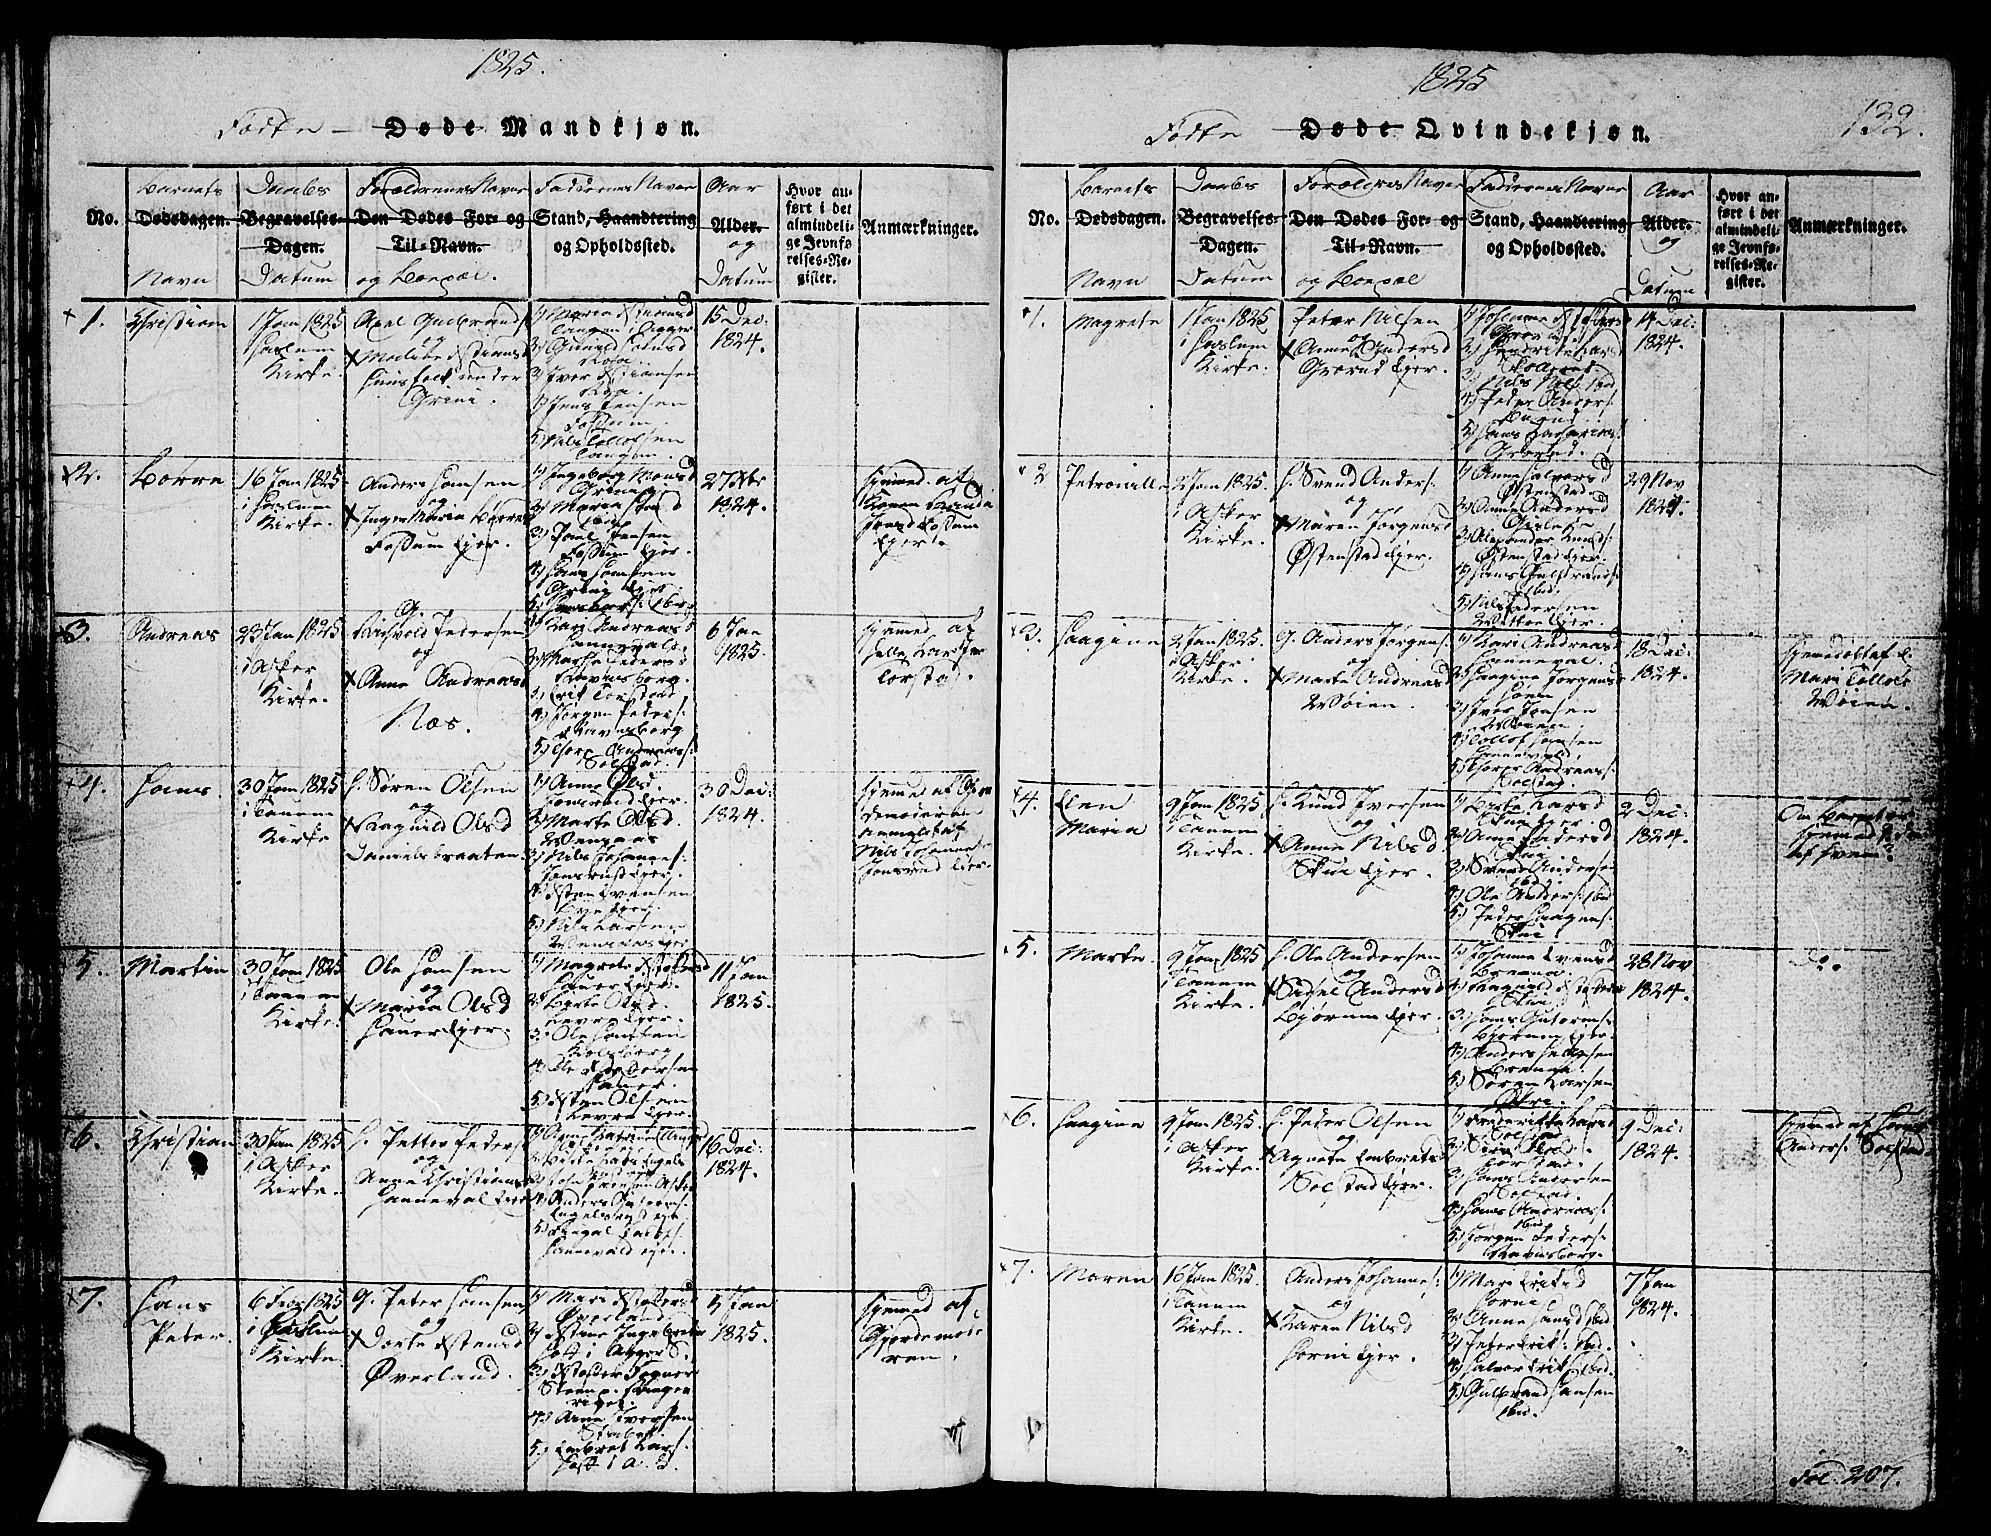 SAO, Asker prestekontor Kirkebøker, G/Ga/L0001: Klokkerbok nr. I 1, 1814-1830, s. 132